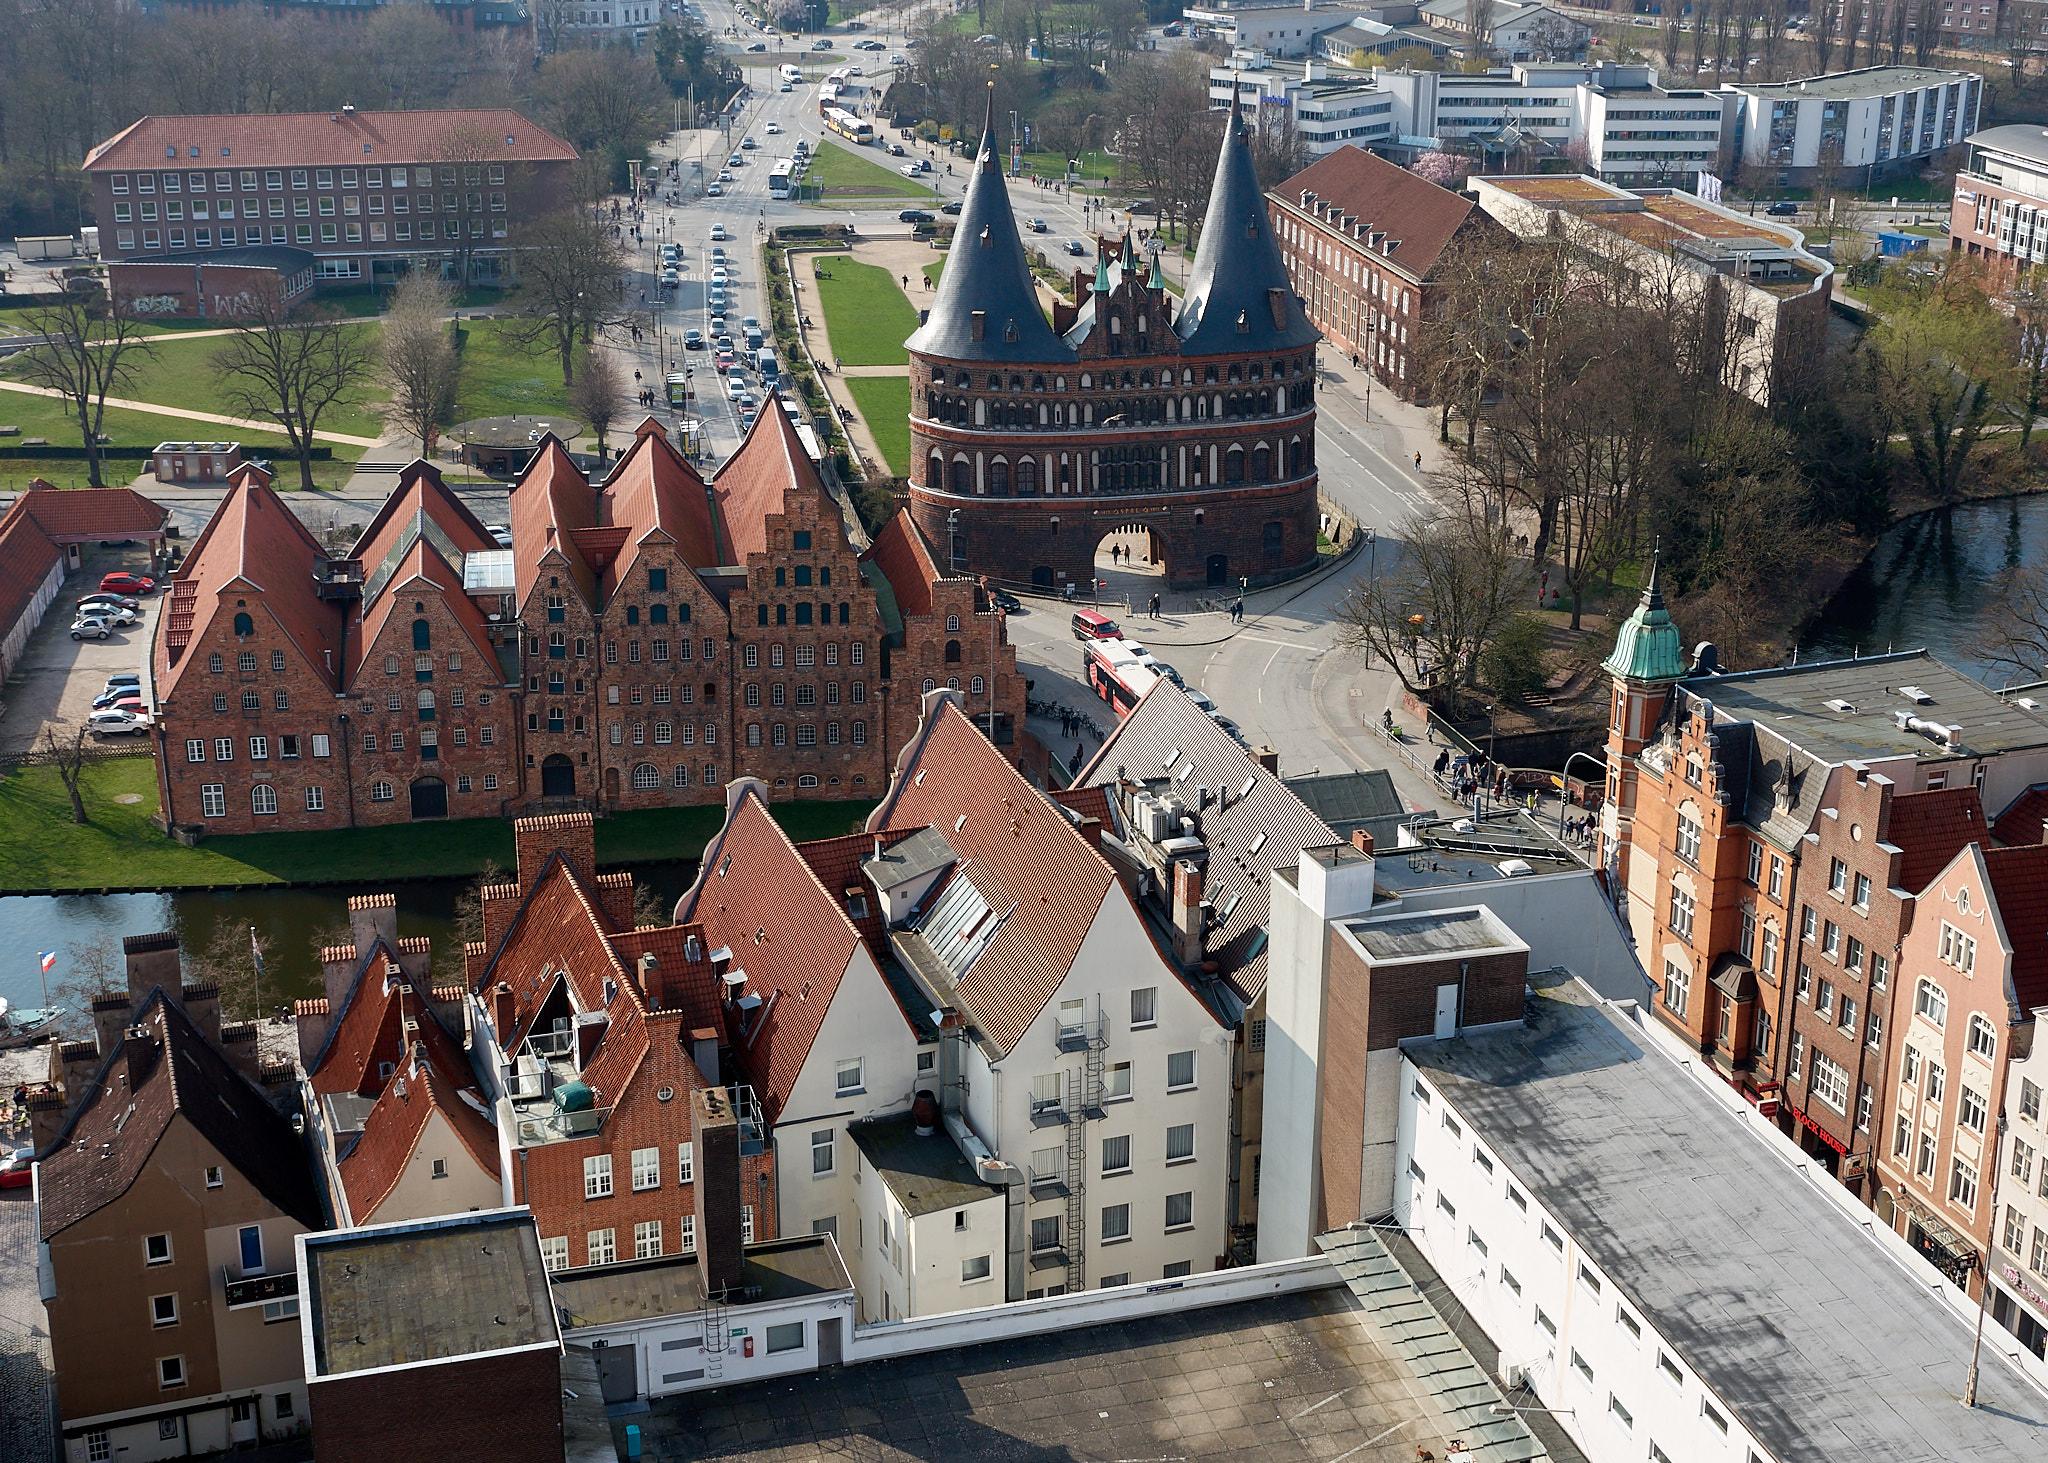 20190330-Lübeck-270.jpg